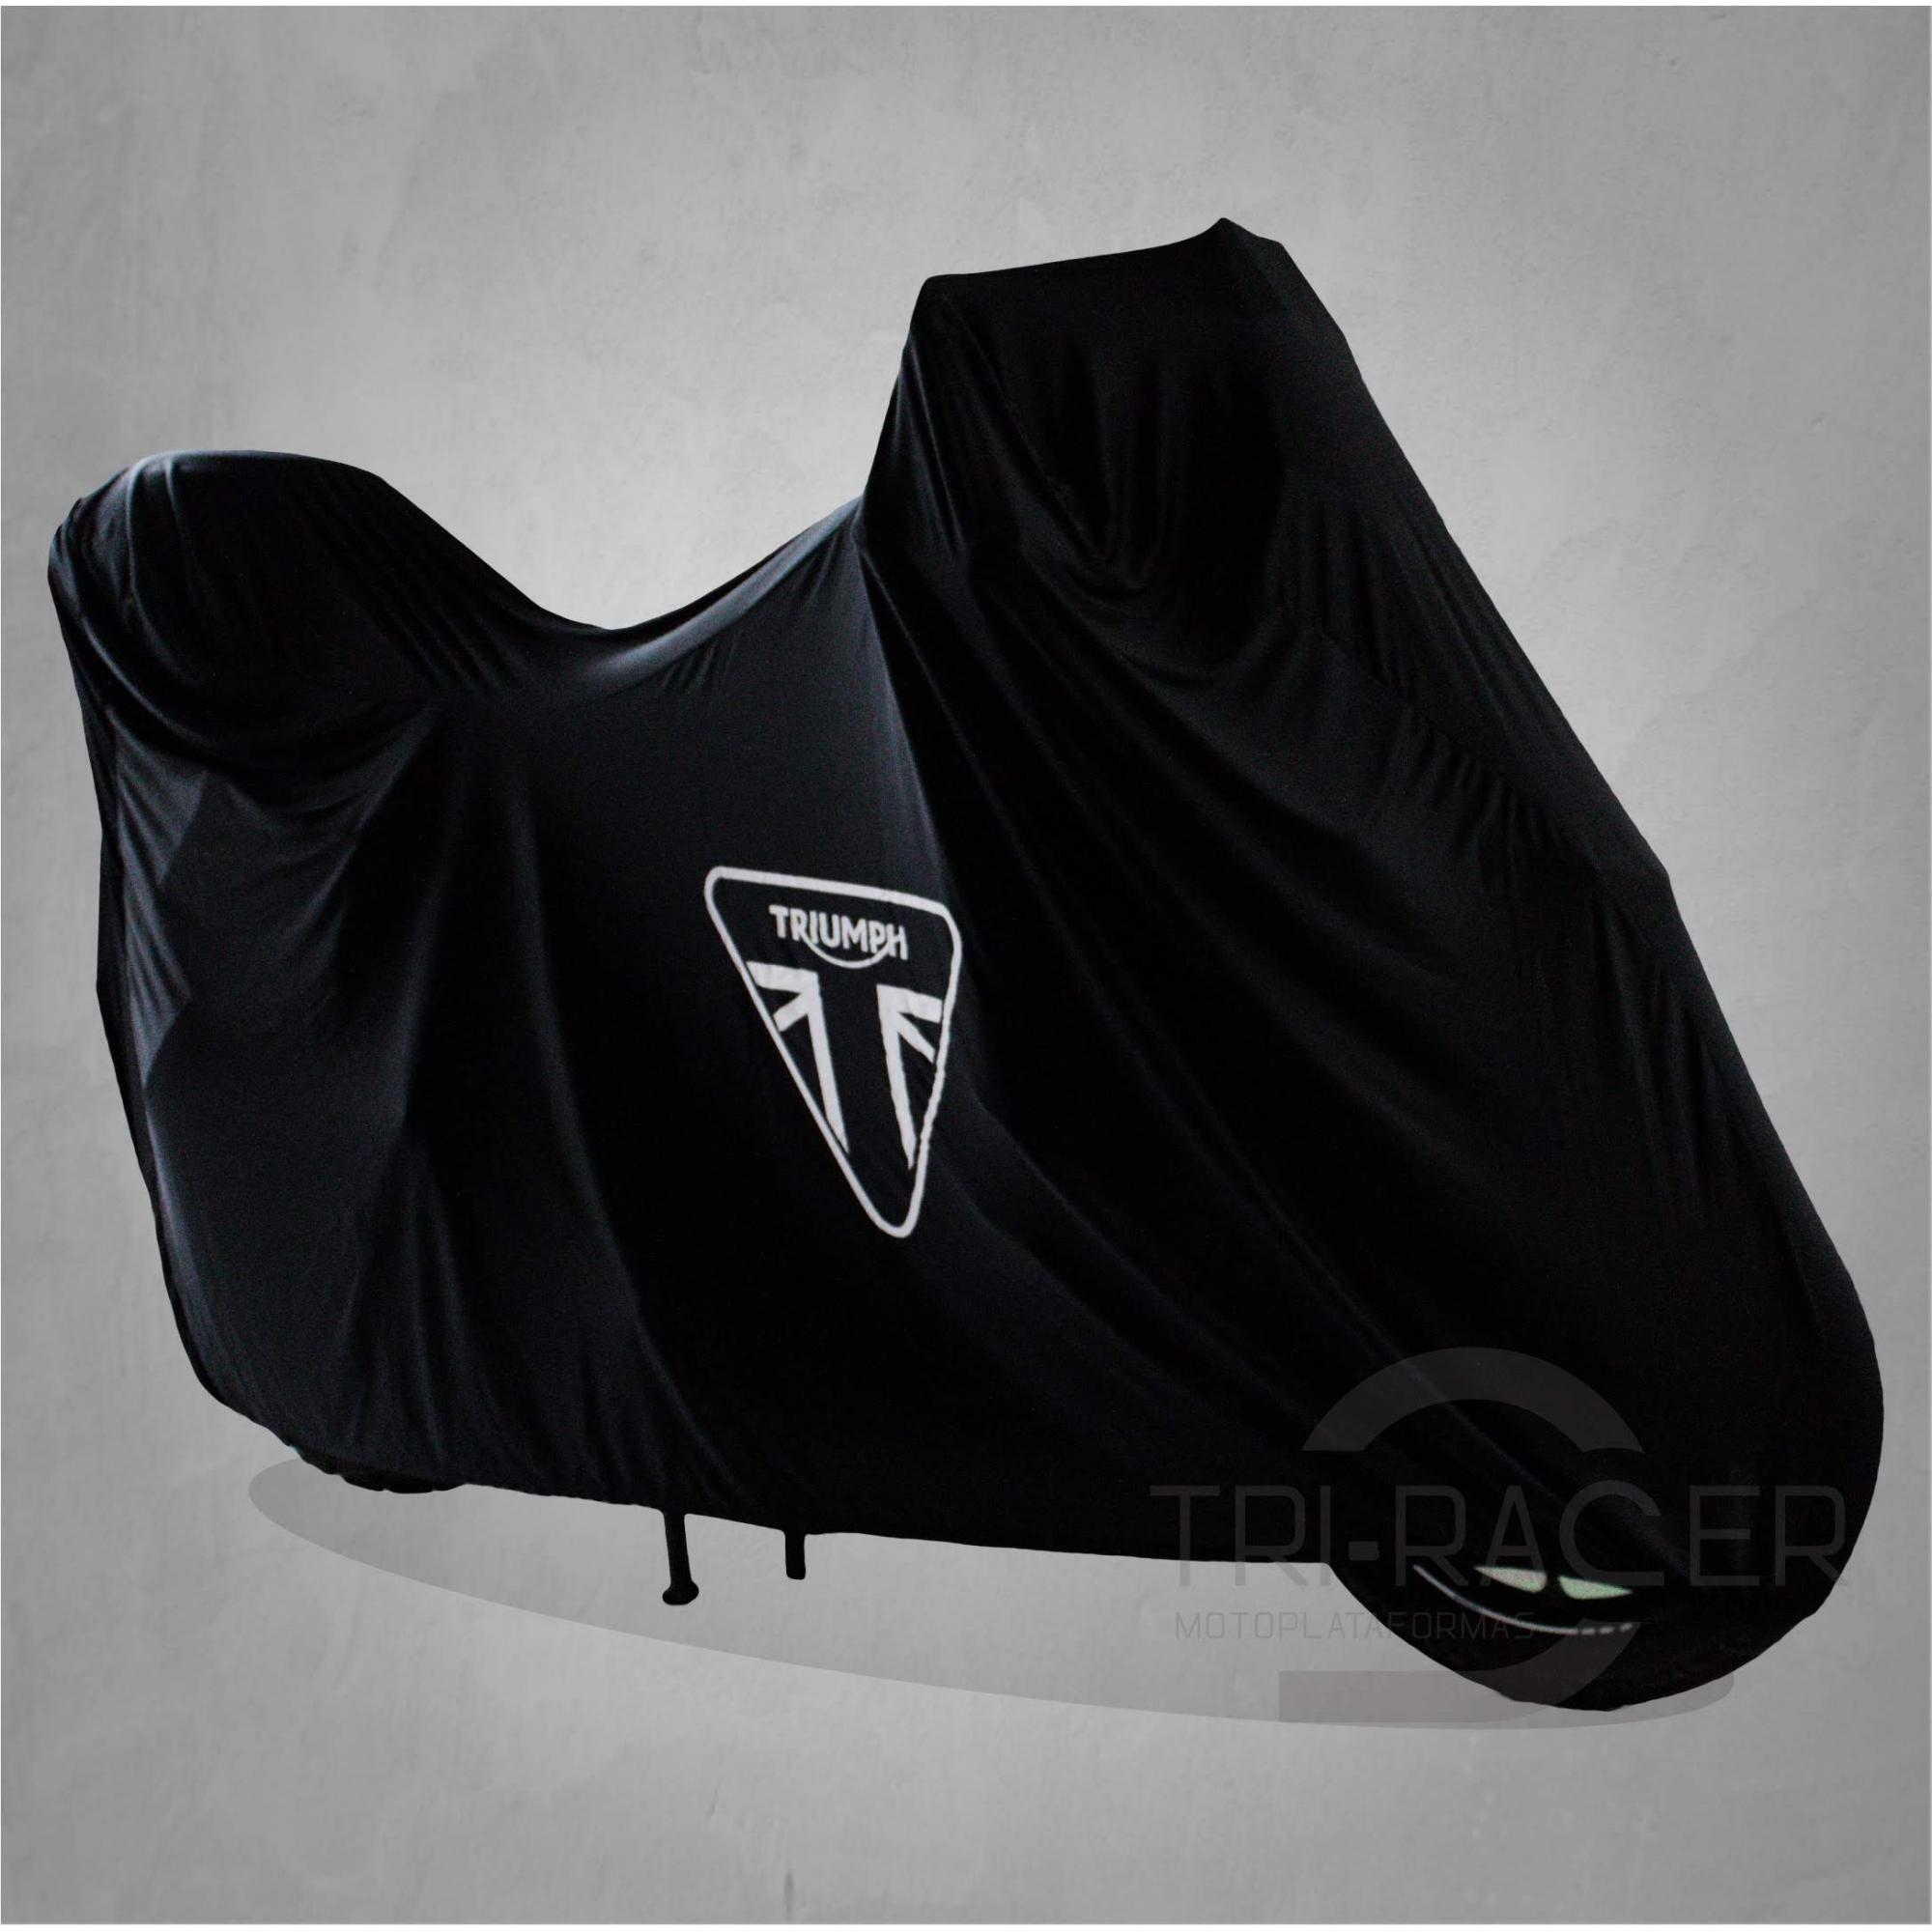 Capa Para Moto Premium Triumph Tam. GG BAÚ (permeavel)